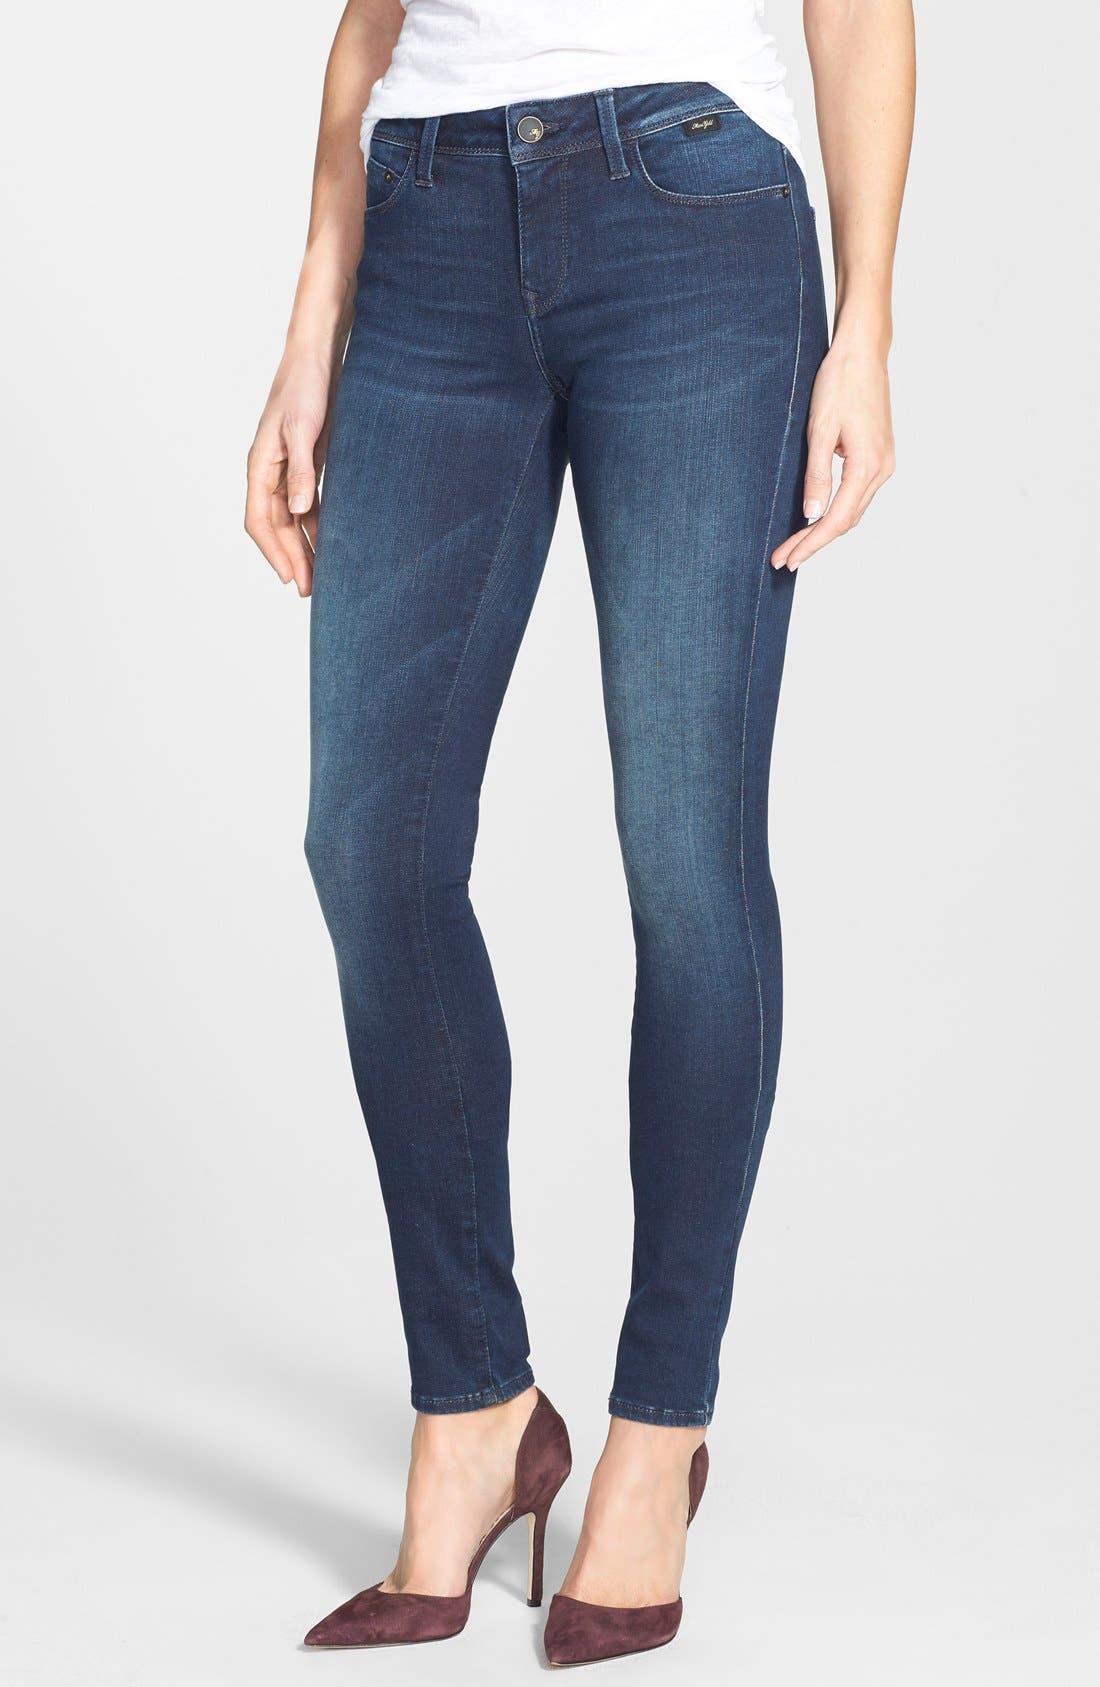 Alternate Image 1 Selected - Mavi Jeans Gold 'Alexa' Stretch Skinny Jeans (Deep Reform)